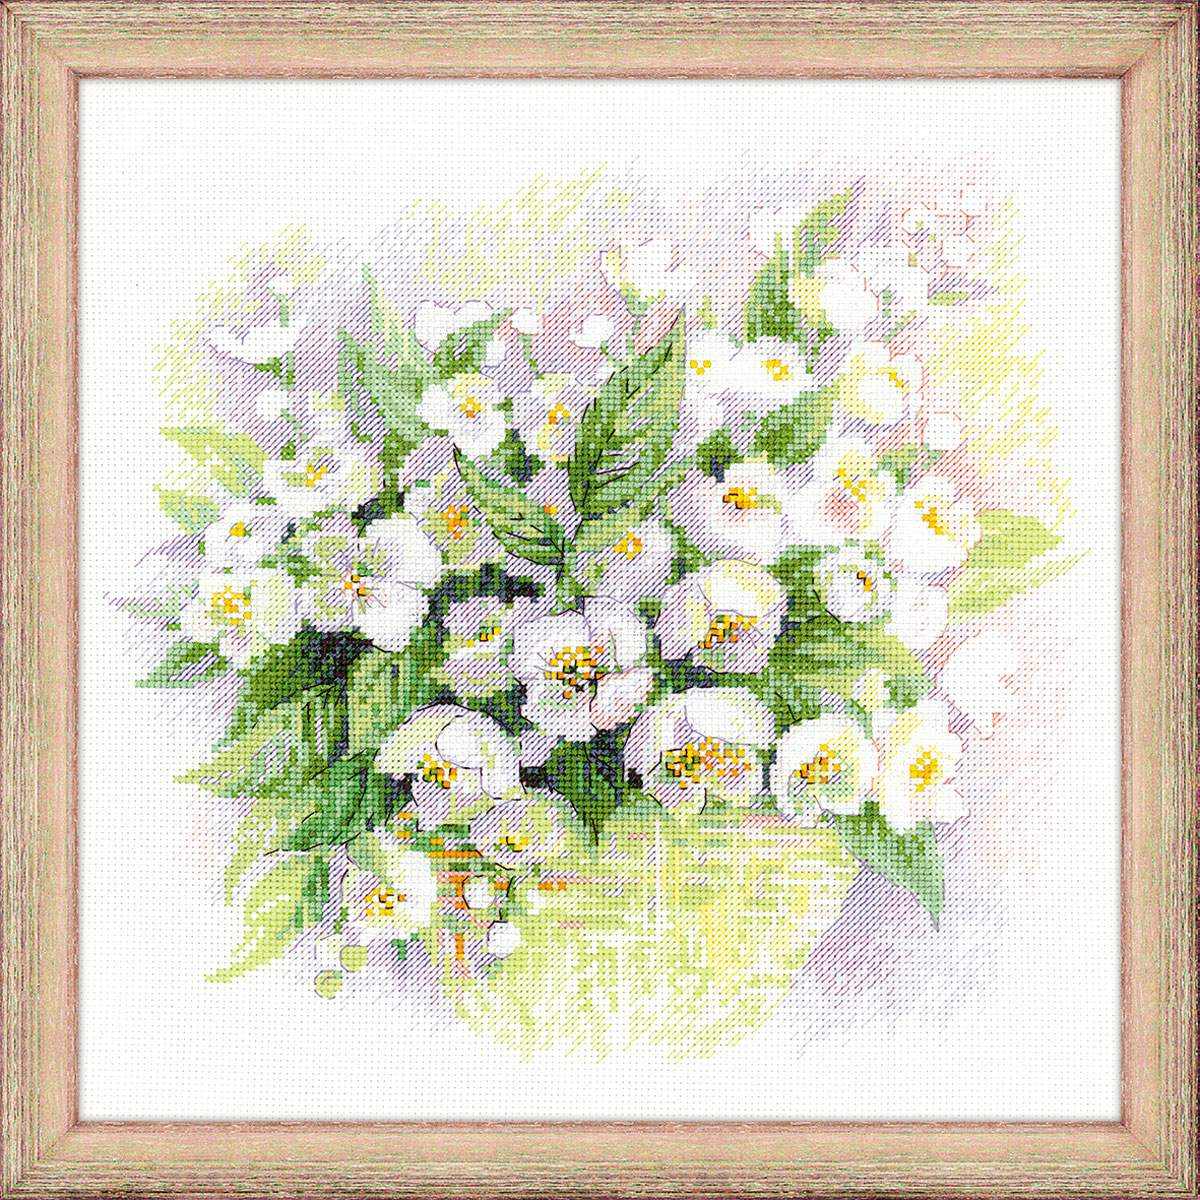 вышивка цветов жасмина